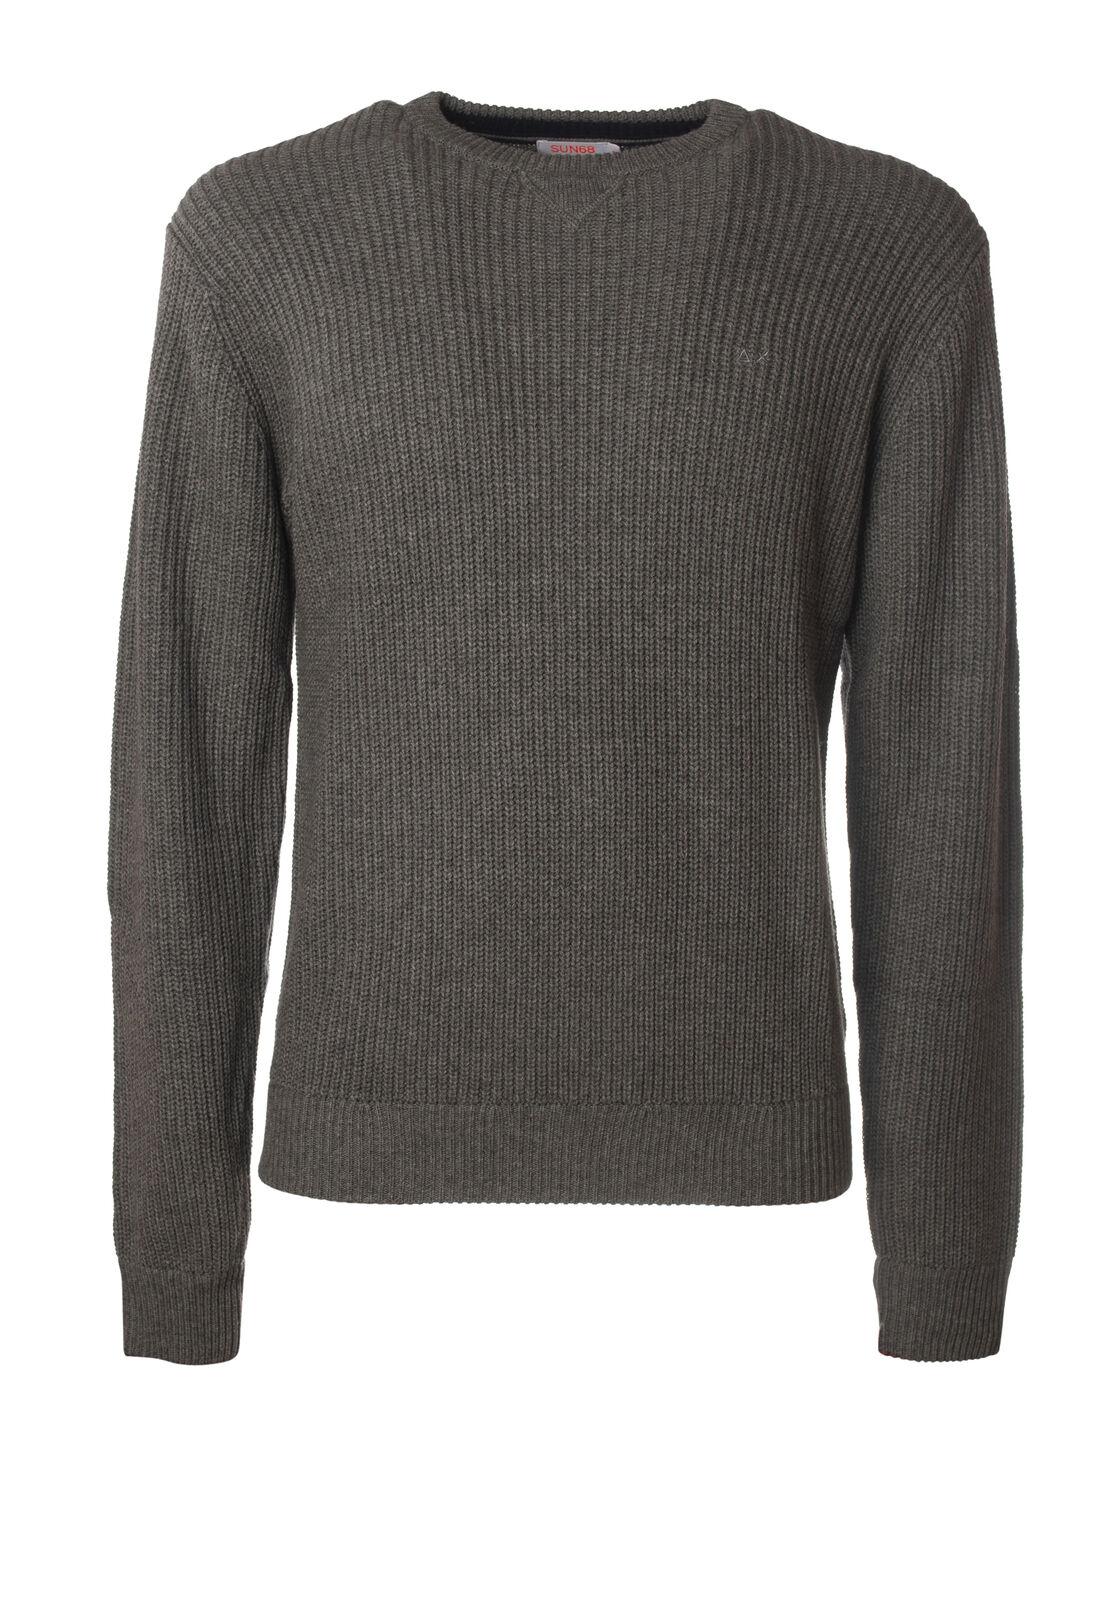 Sun 68 - Knitwear-Sweaters - Man - Grau - 5559926I184602